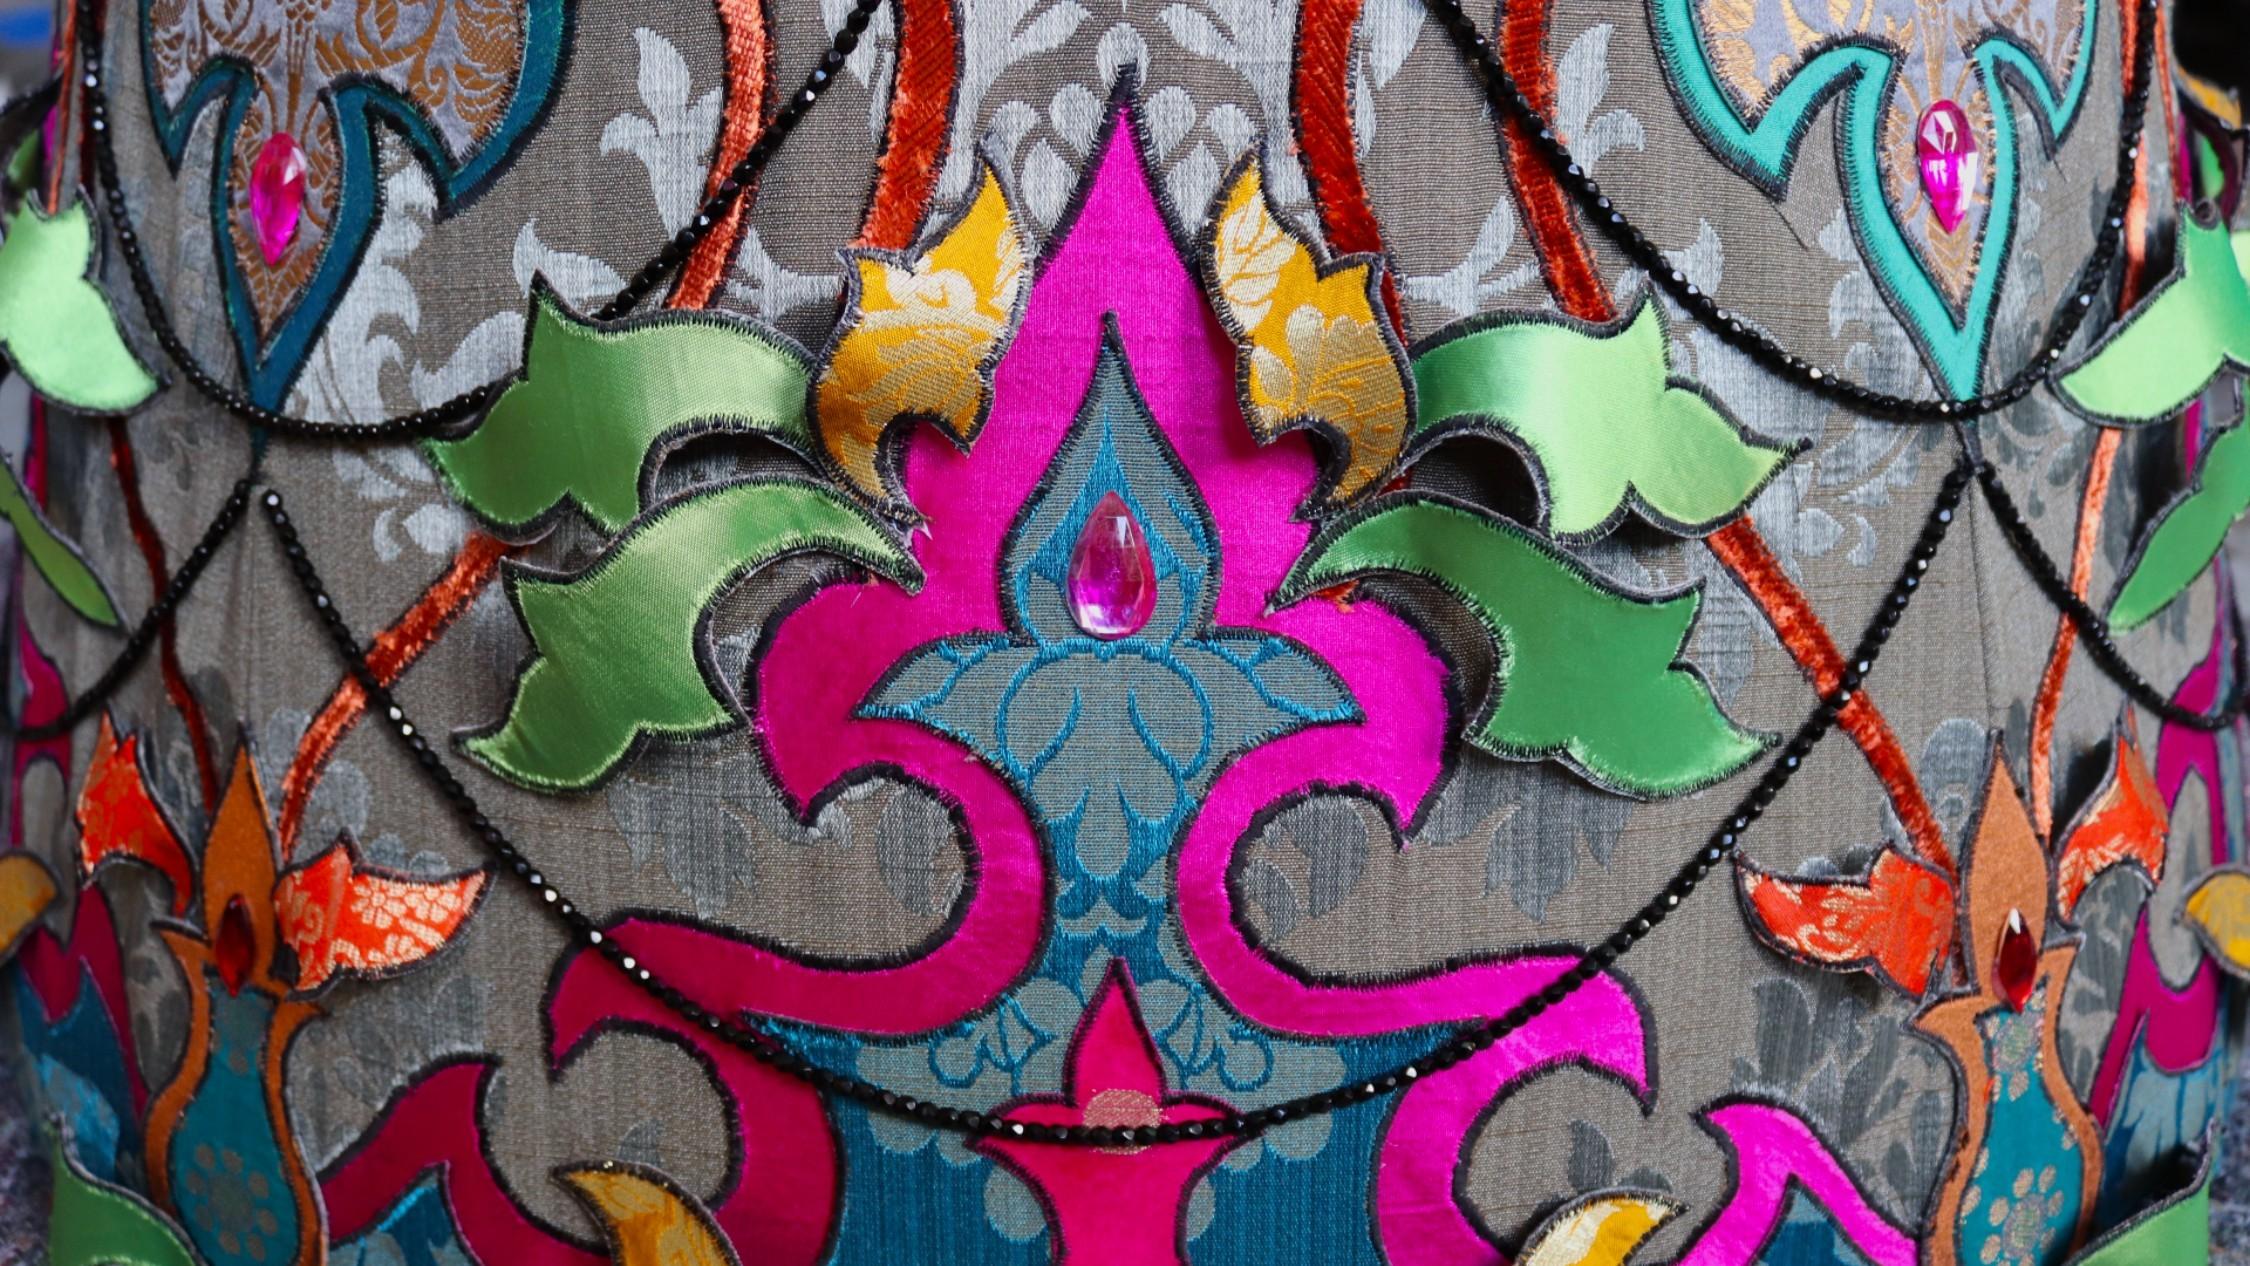 a stunning, colourful textile sculpture